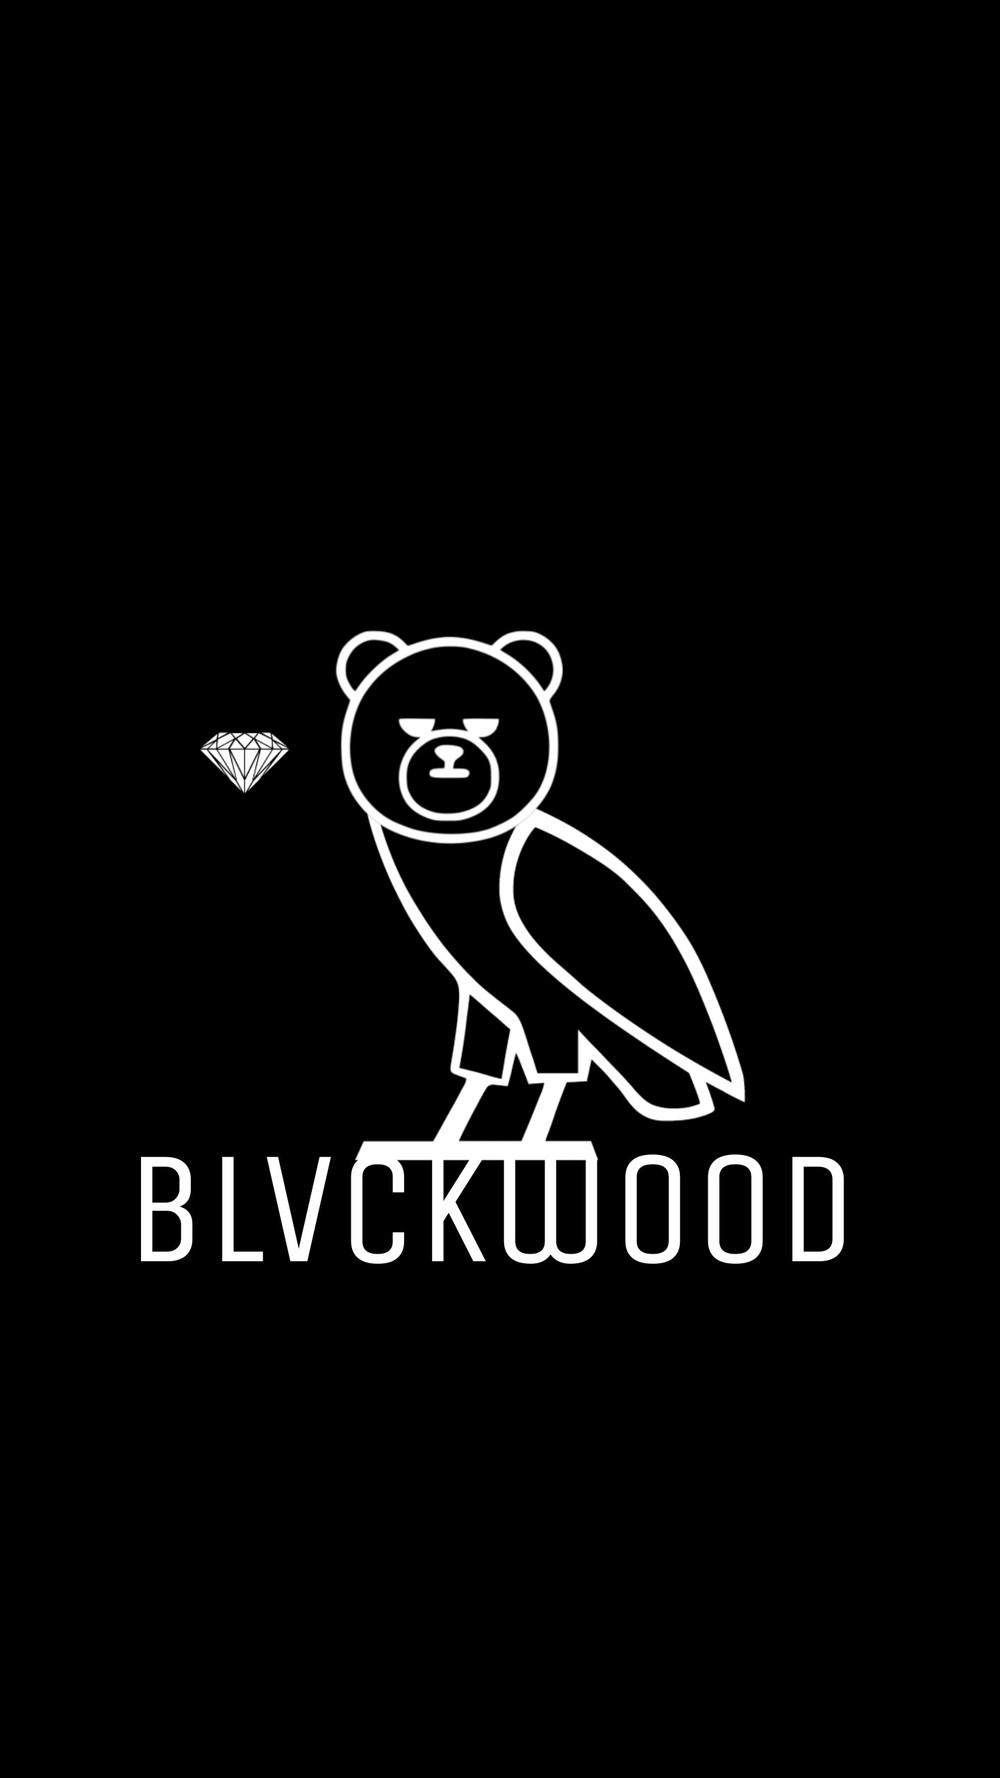 679e05efdc6 Blackwood Diamond Company